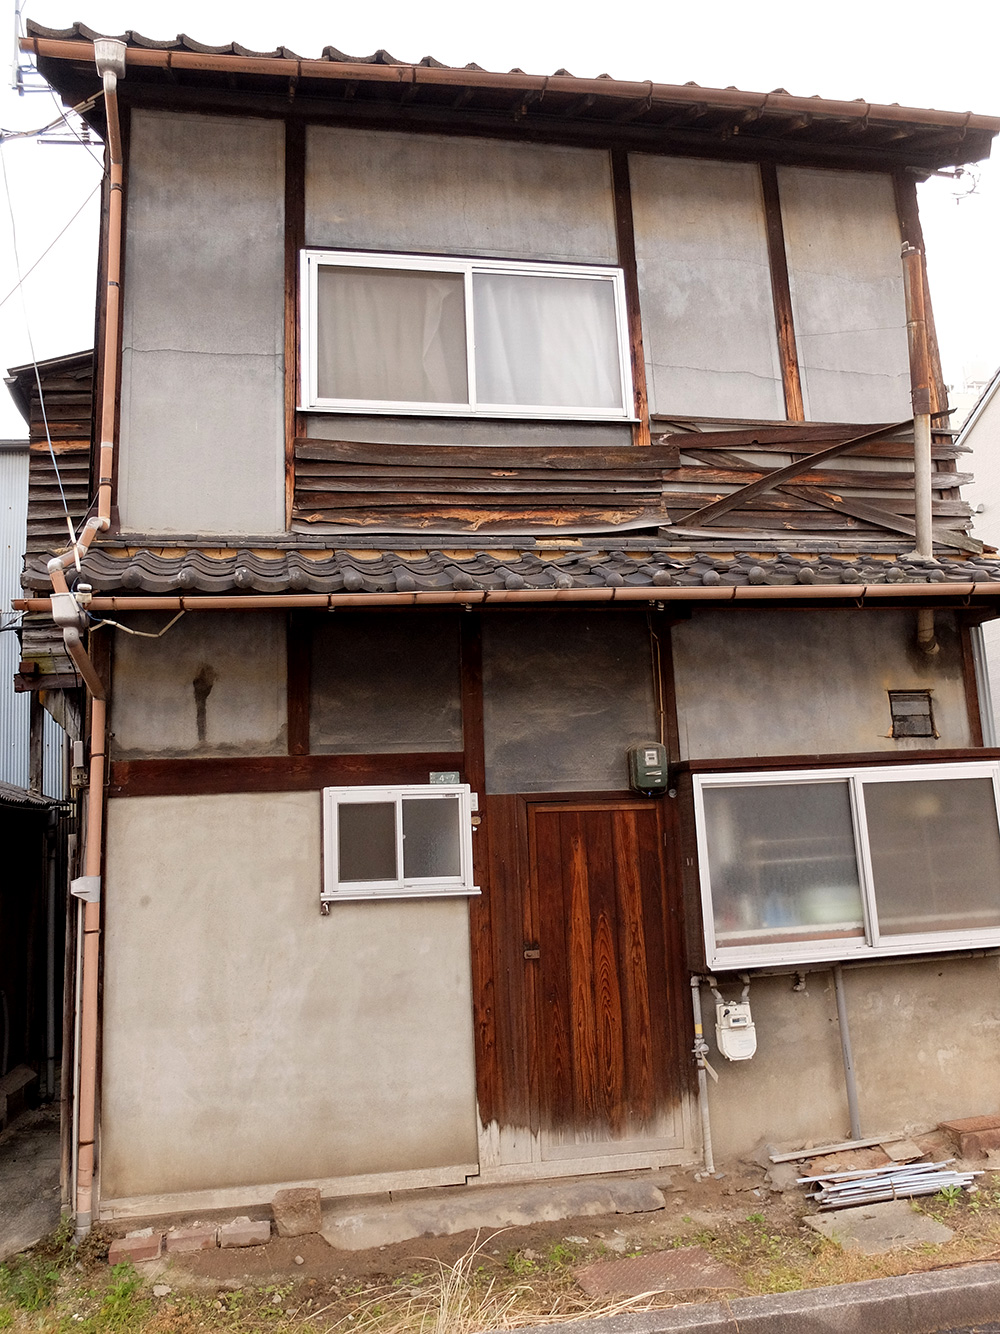 vieille maison Yokogawa